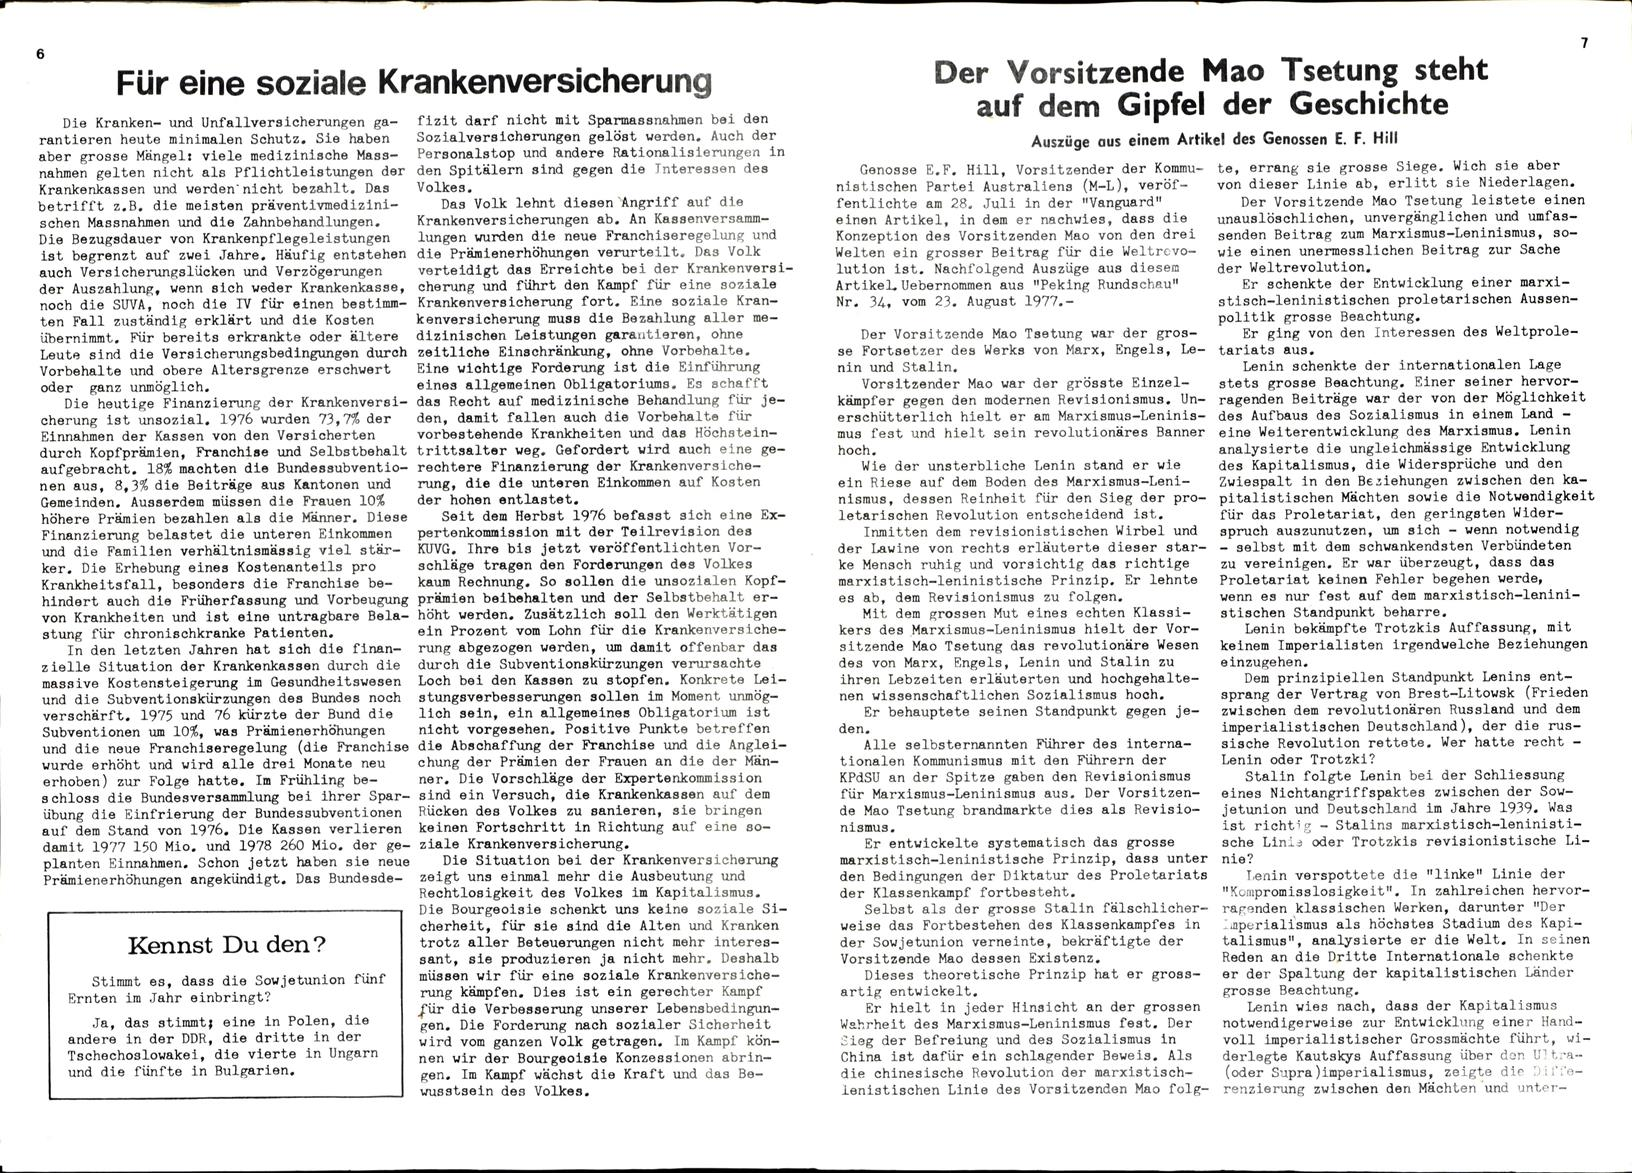 Schweiz_KPSML_Oktober_19771000_115_004